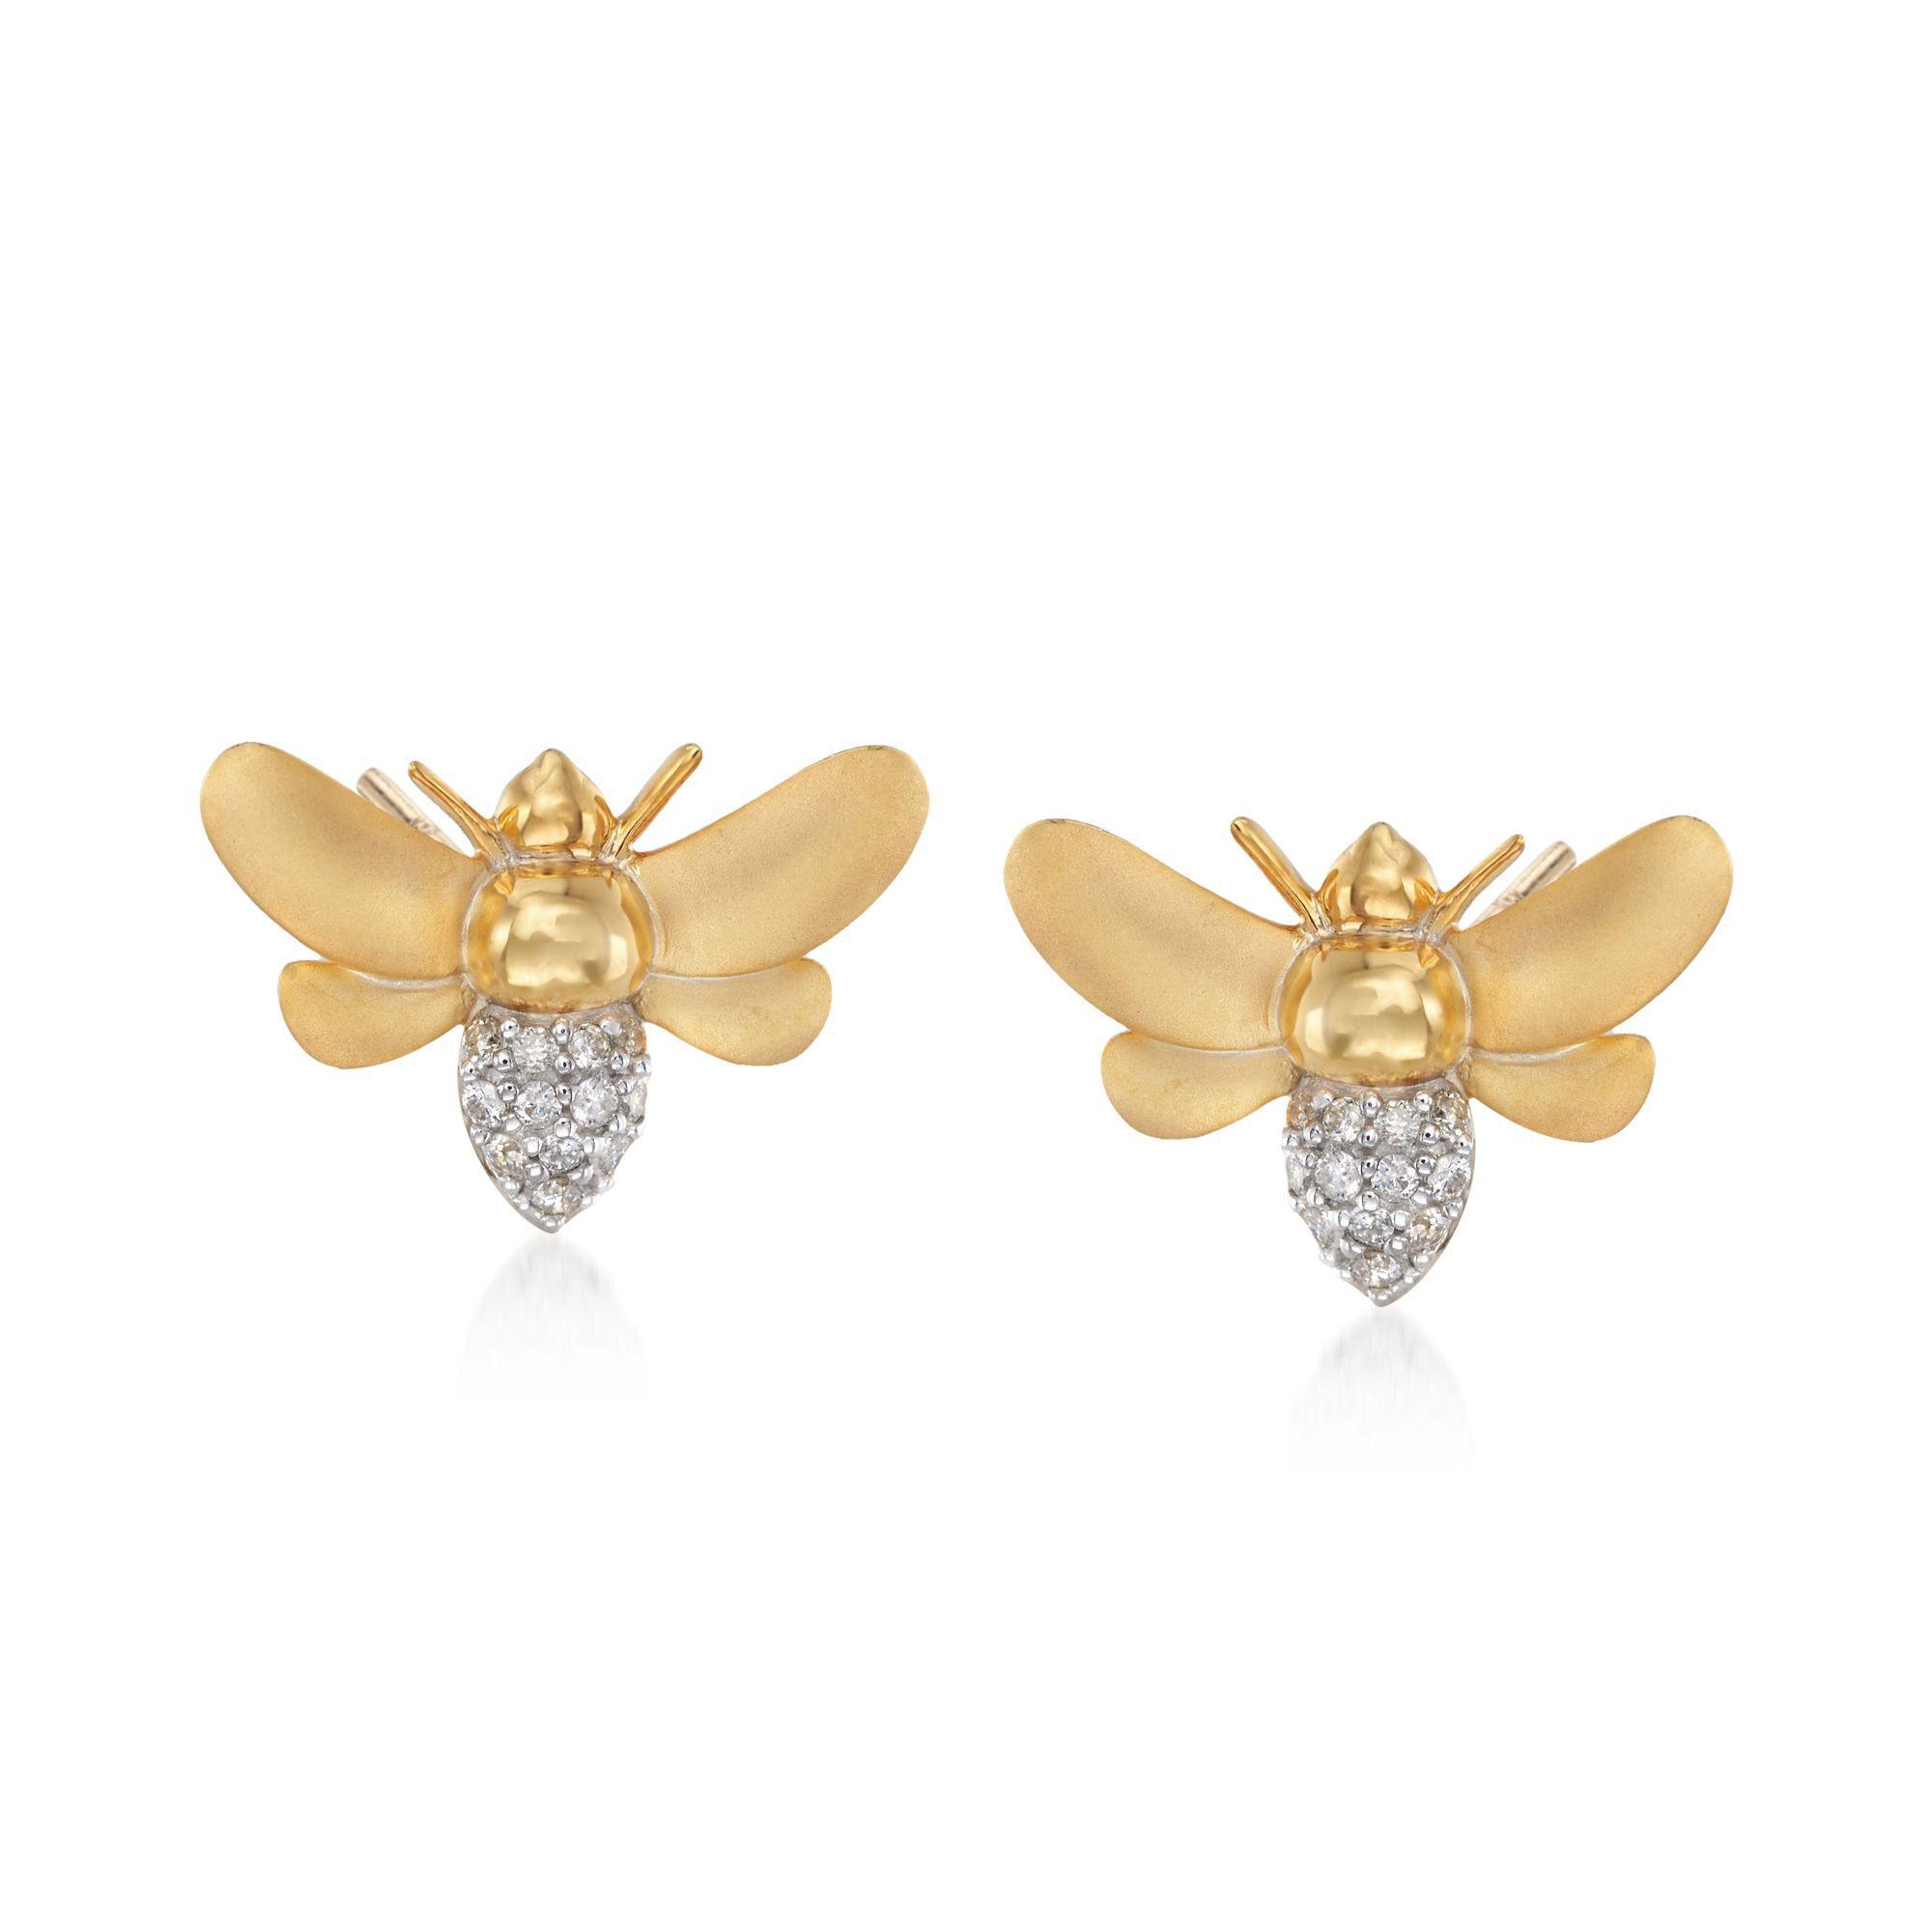 Cute Bee Stud Earrings for Women Honey Bee Earrings Tiny Animal Jewelry Gift